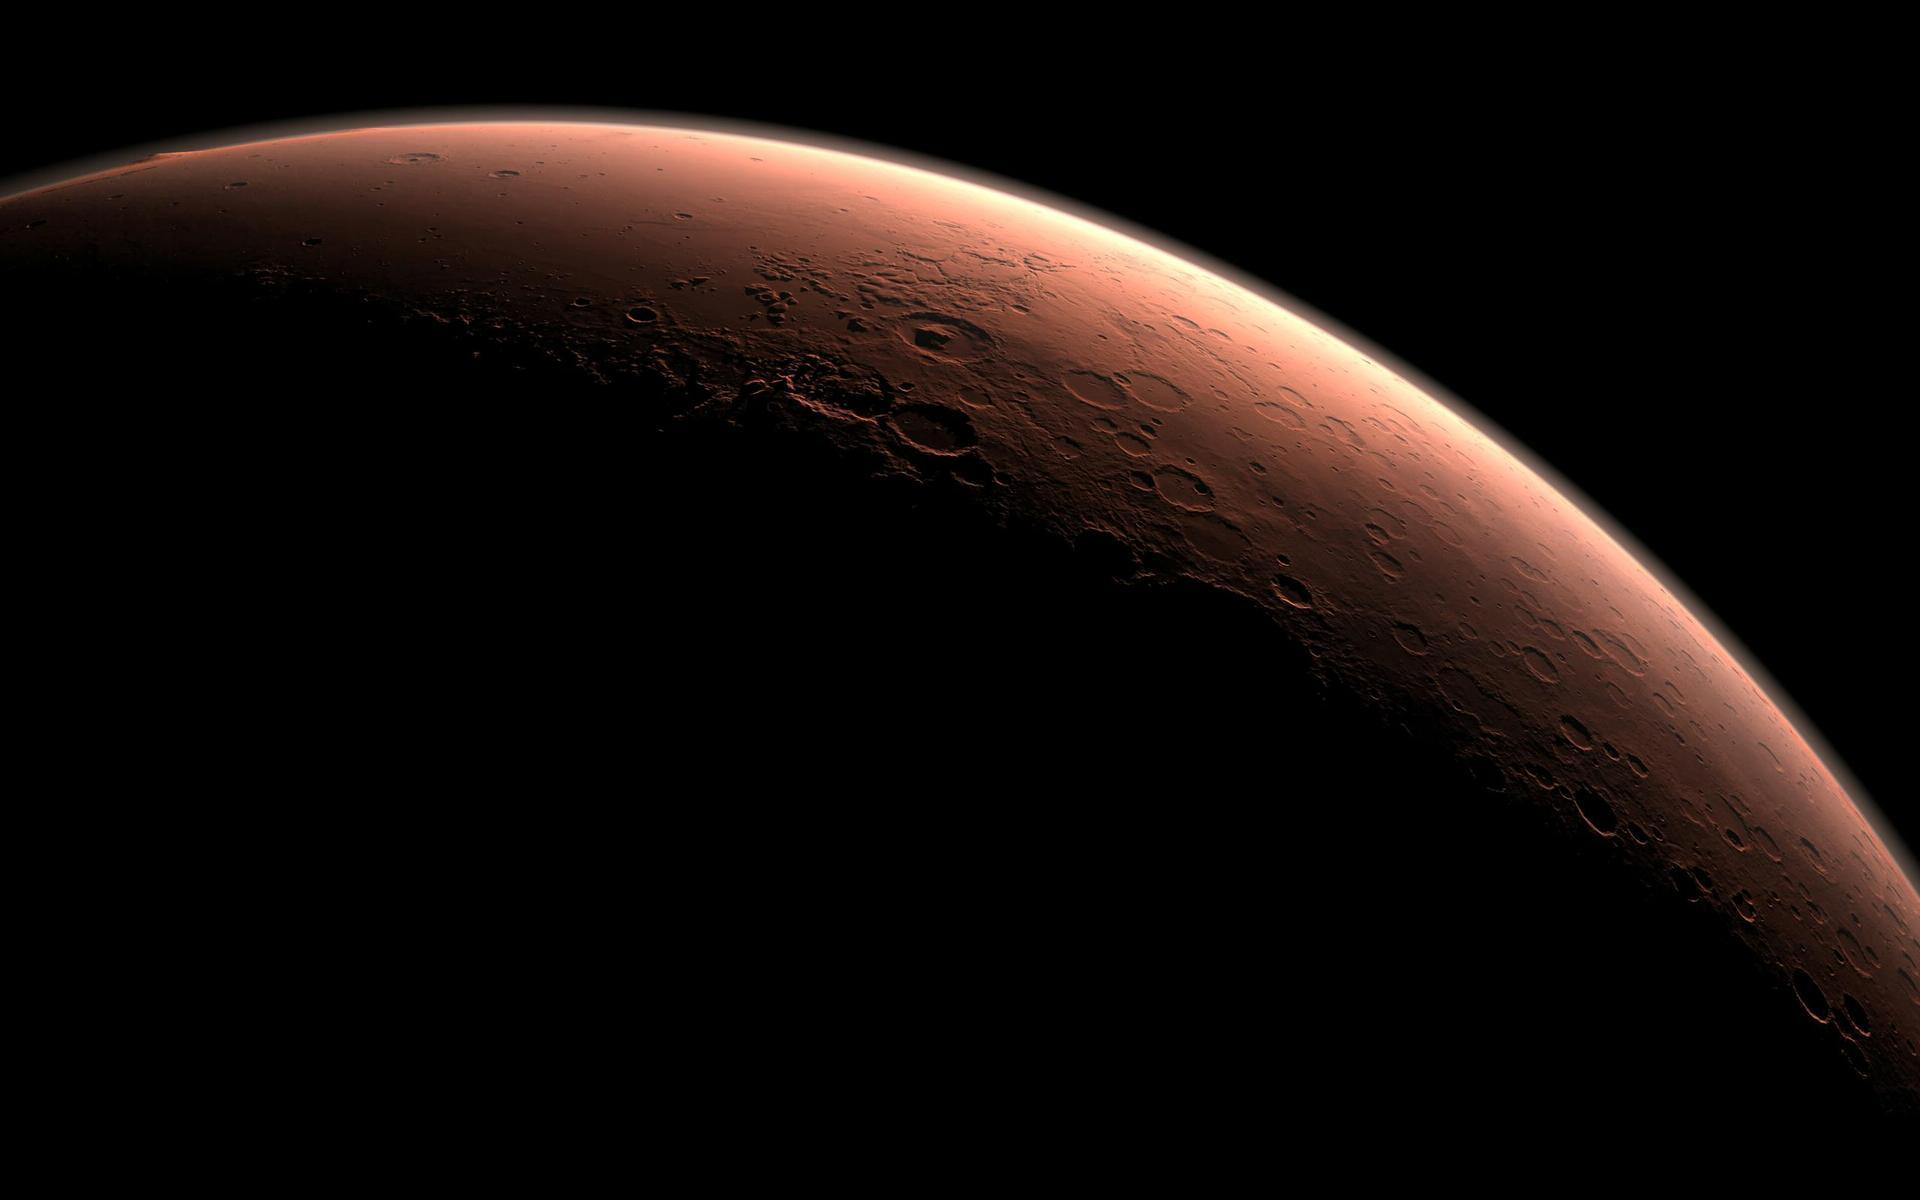 mars planet wallpaper 48837